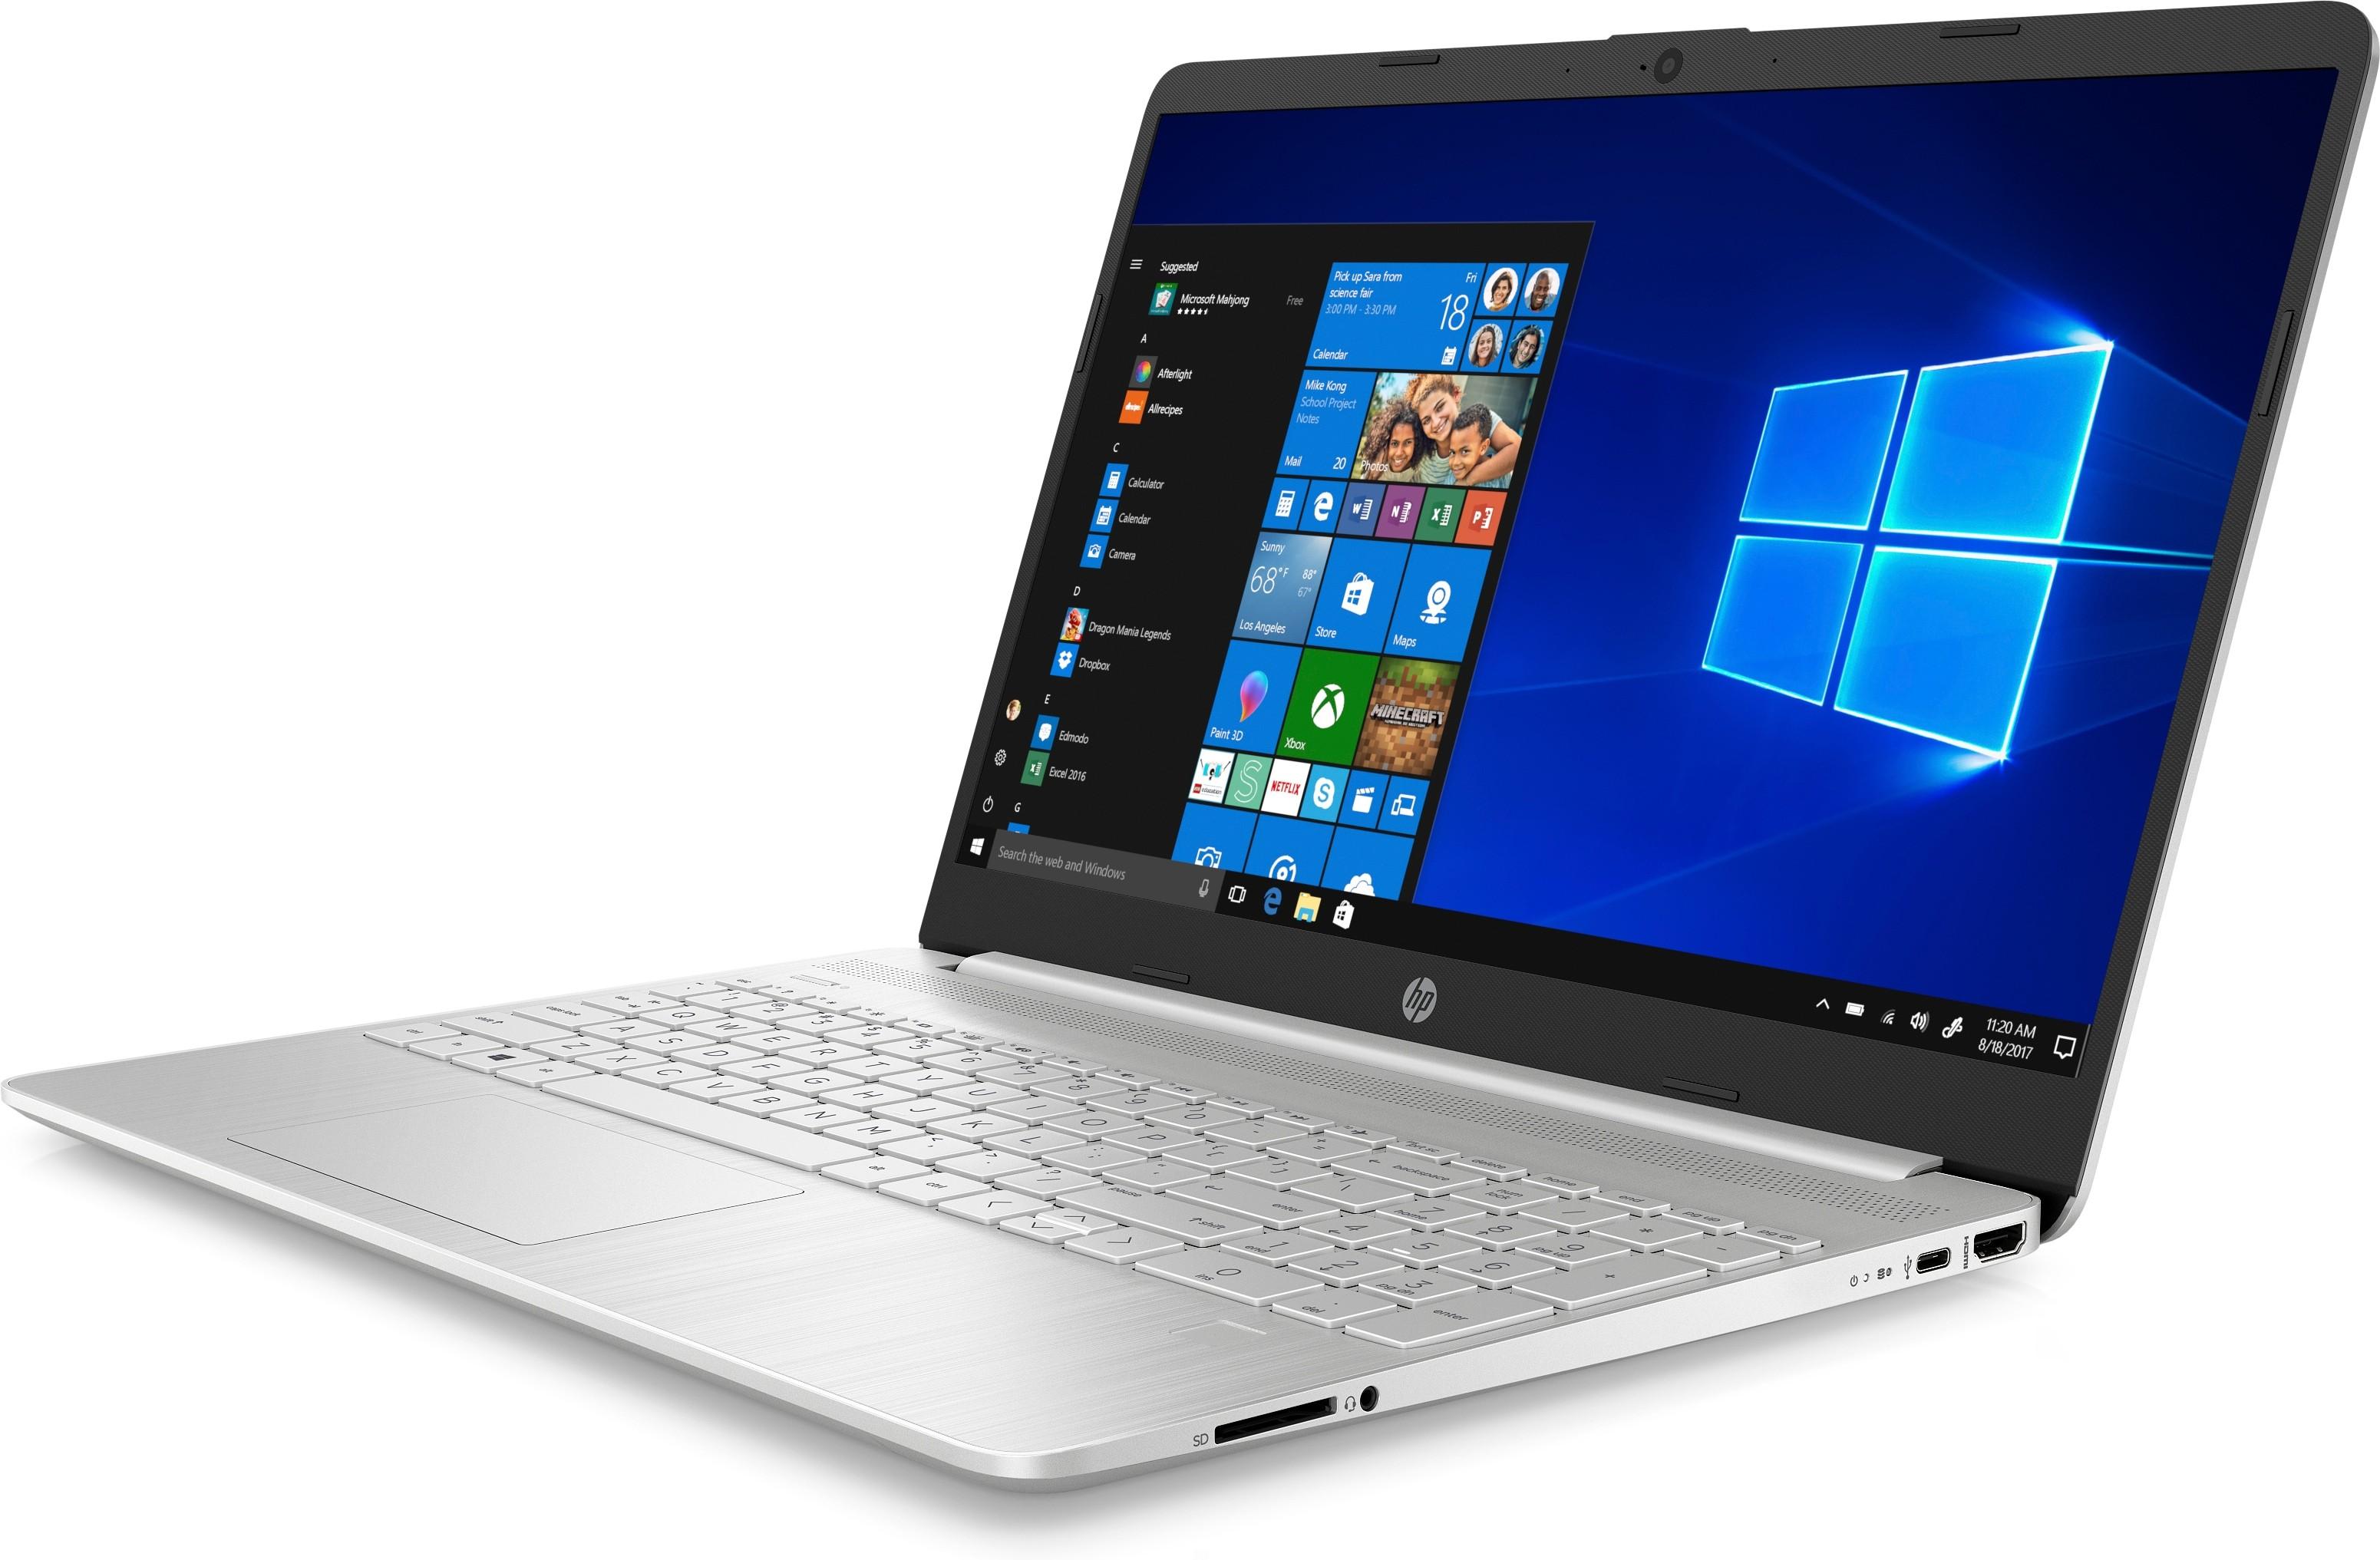 "HP 15s-fq1008nd DDR4-SDRAM Notebook 39,6 cm (15.6"") 1920 x 1080 Pixels Intel® 10de generatie Core™ i3 4 GB 128 GB SSD Wi-Fi 5 (802.11ac) Windows 10 Home S Zilver"